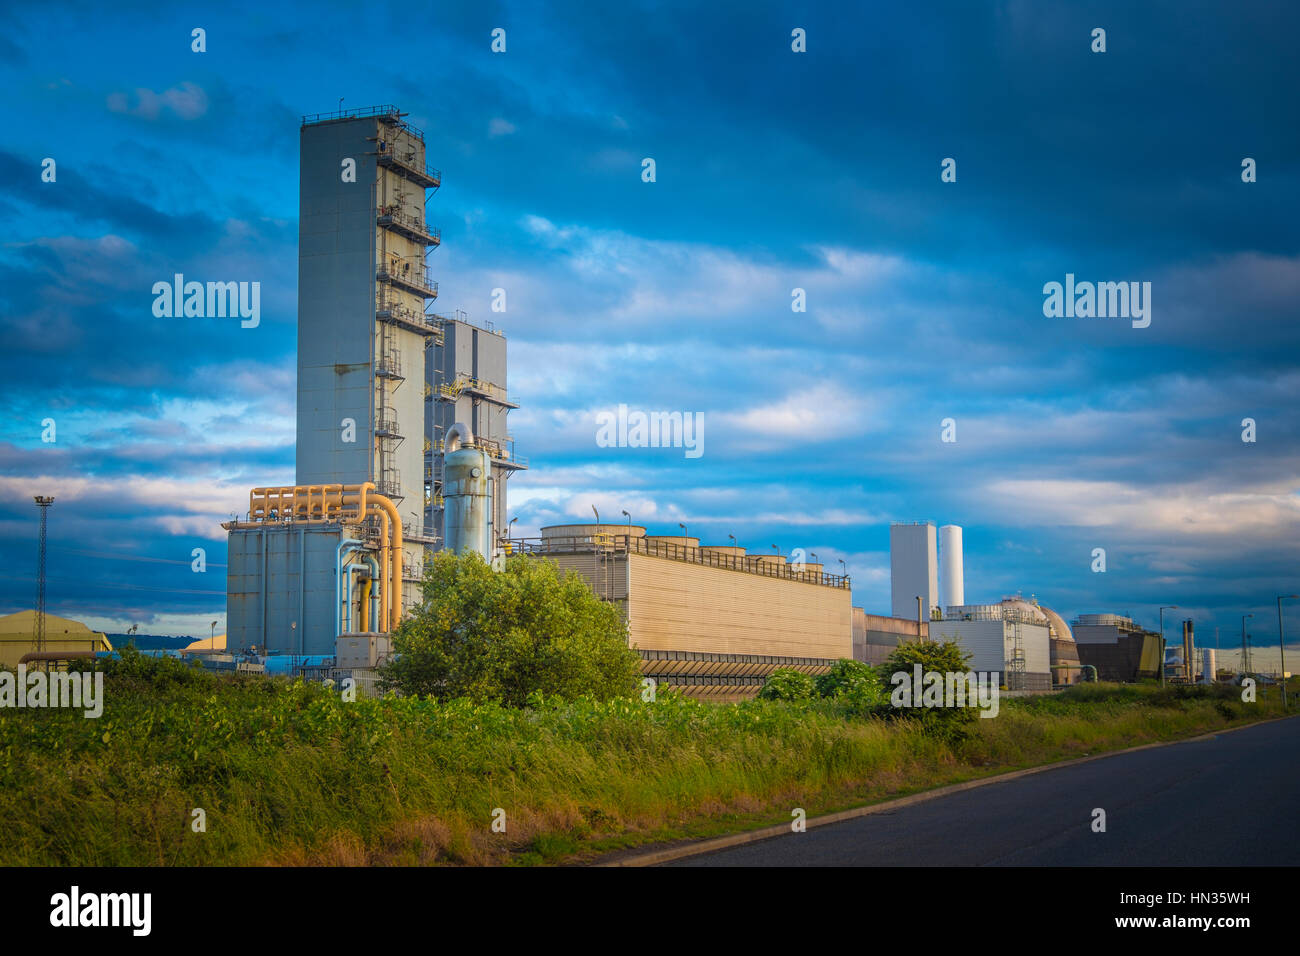 BOC Industrial works on Teeside. - Stock Image